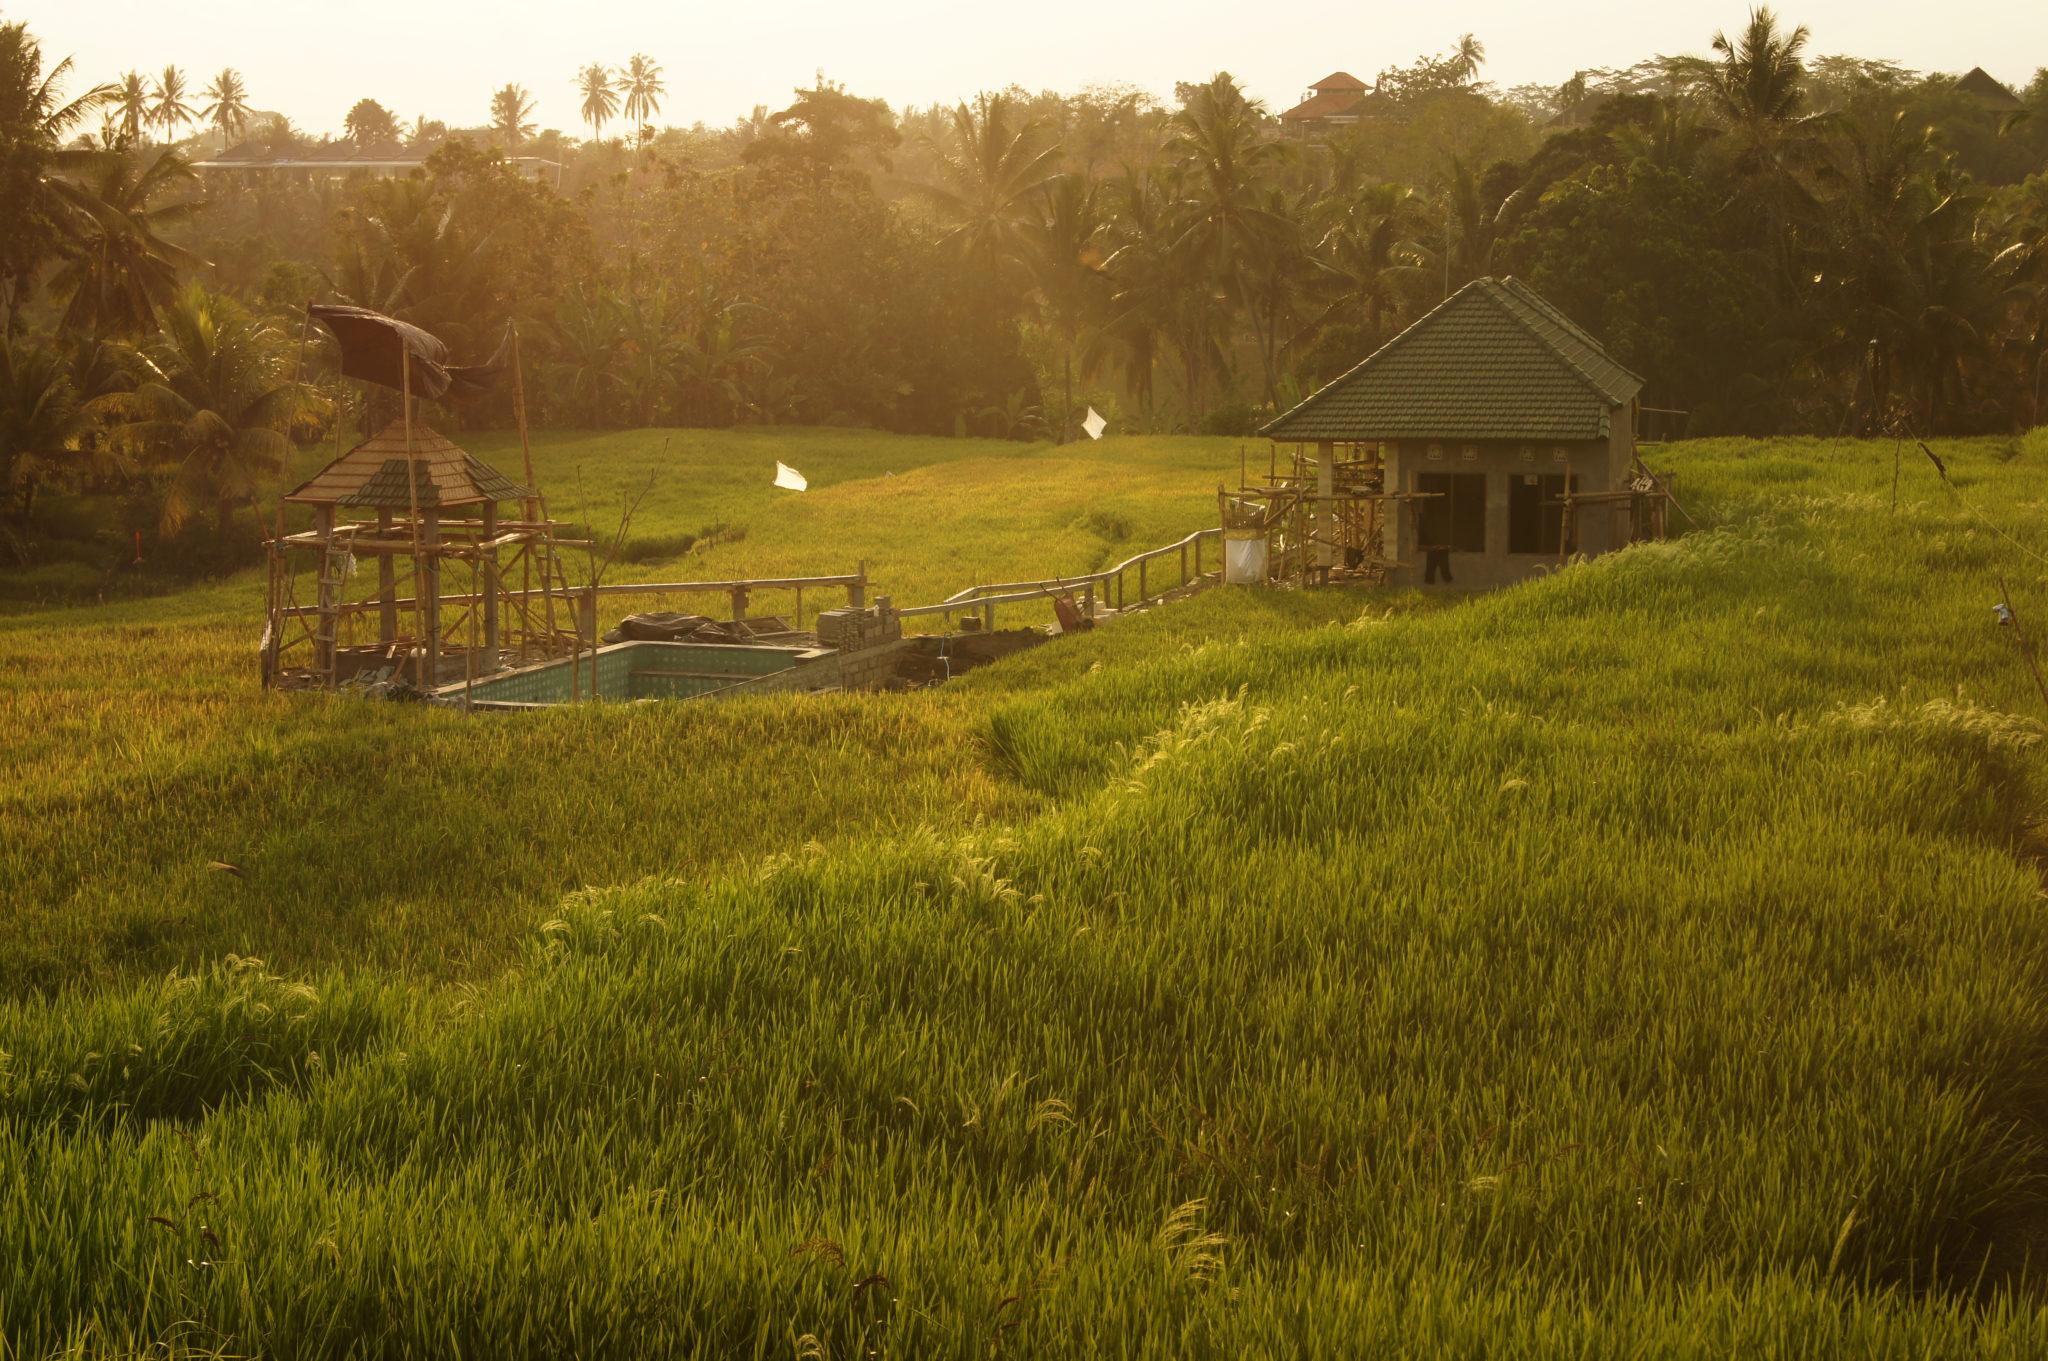 Indonesien-Reisetipps-Reisefelder-Bali